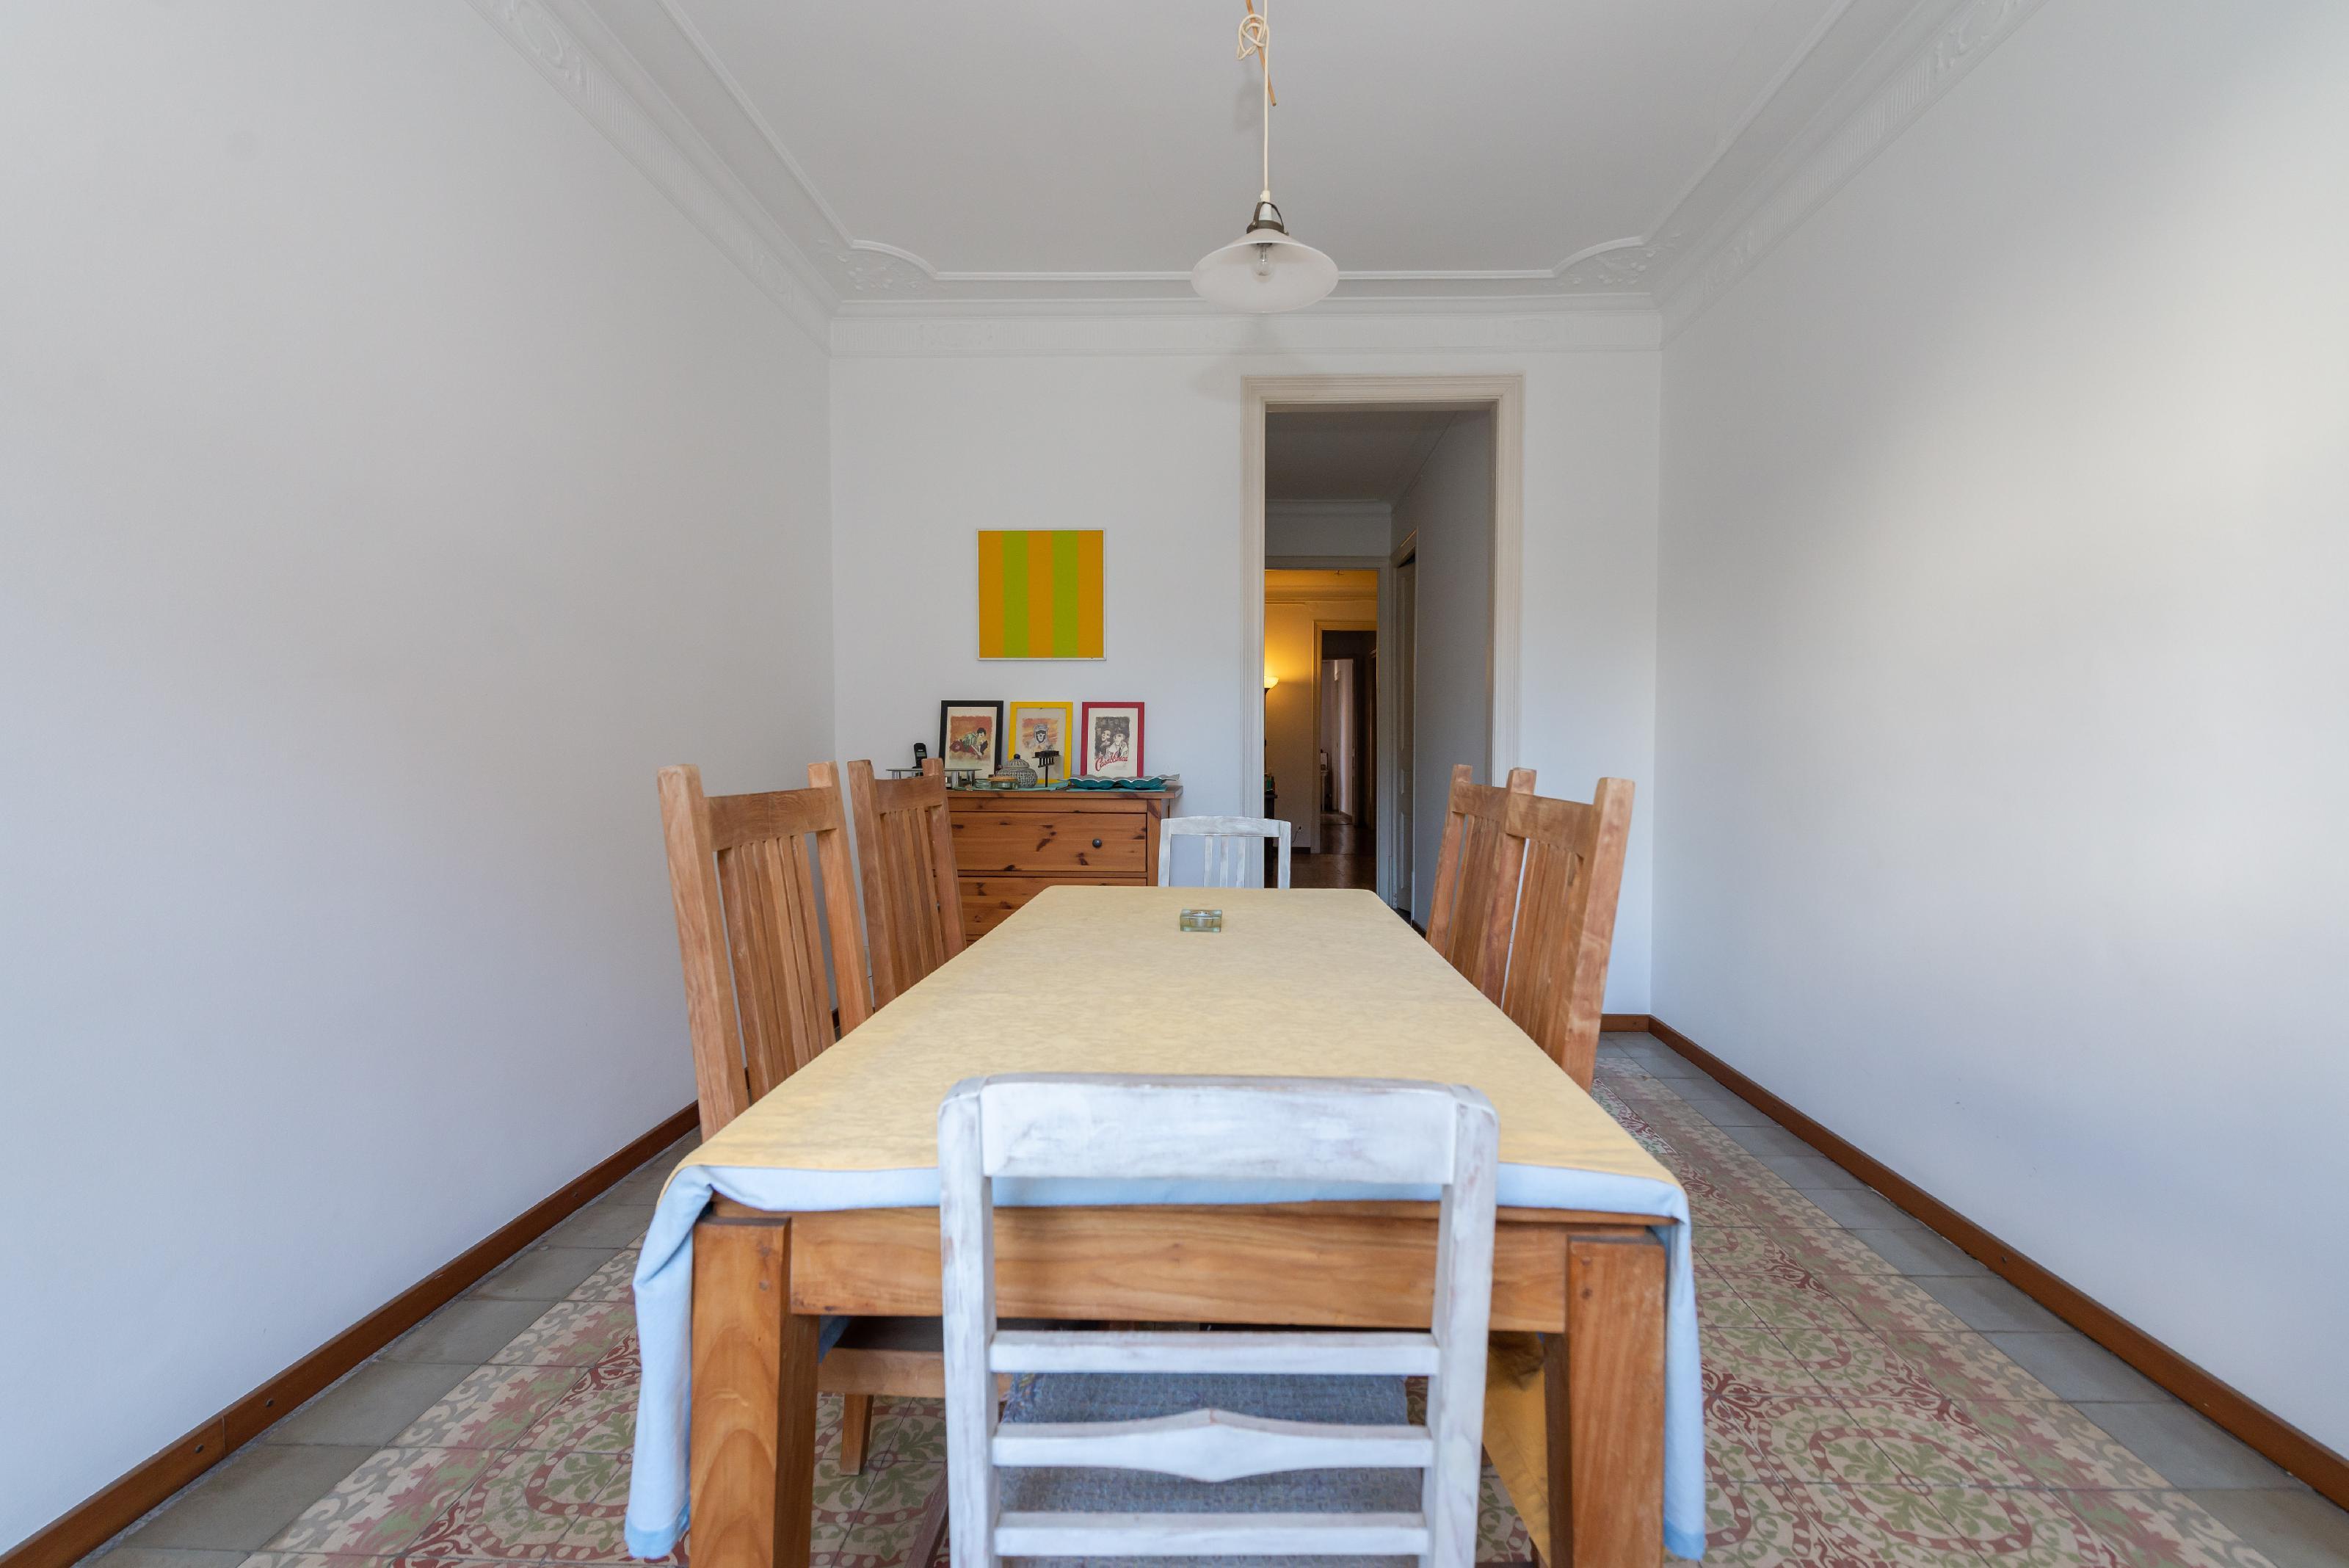 250582 Flat for sale in Sarrià-Sant Gervasi, Sant Gervasi-Galvany 23